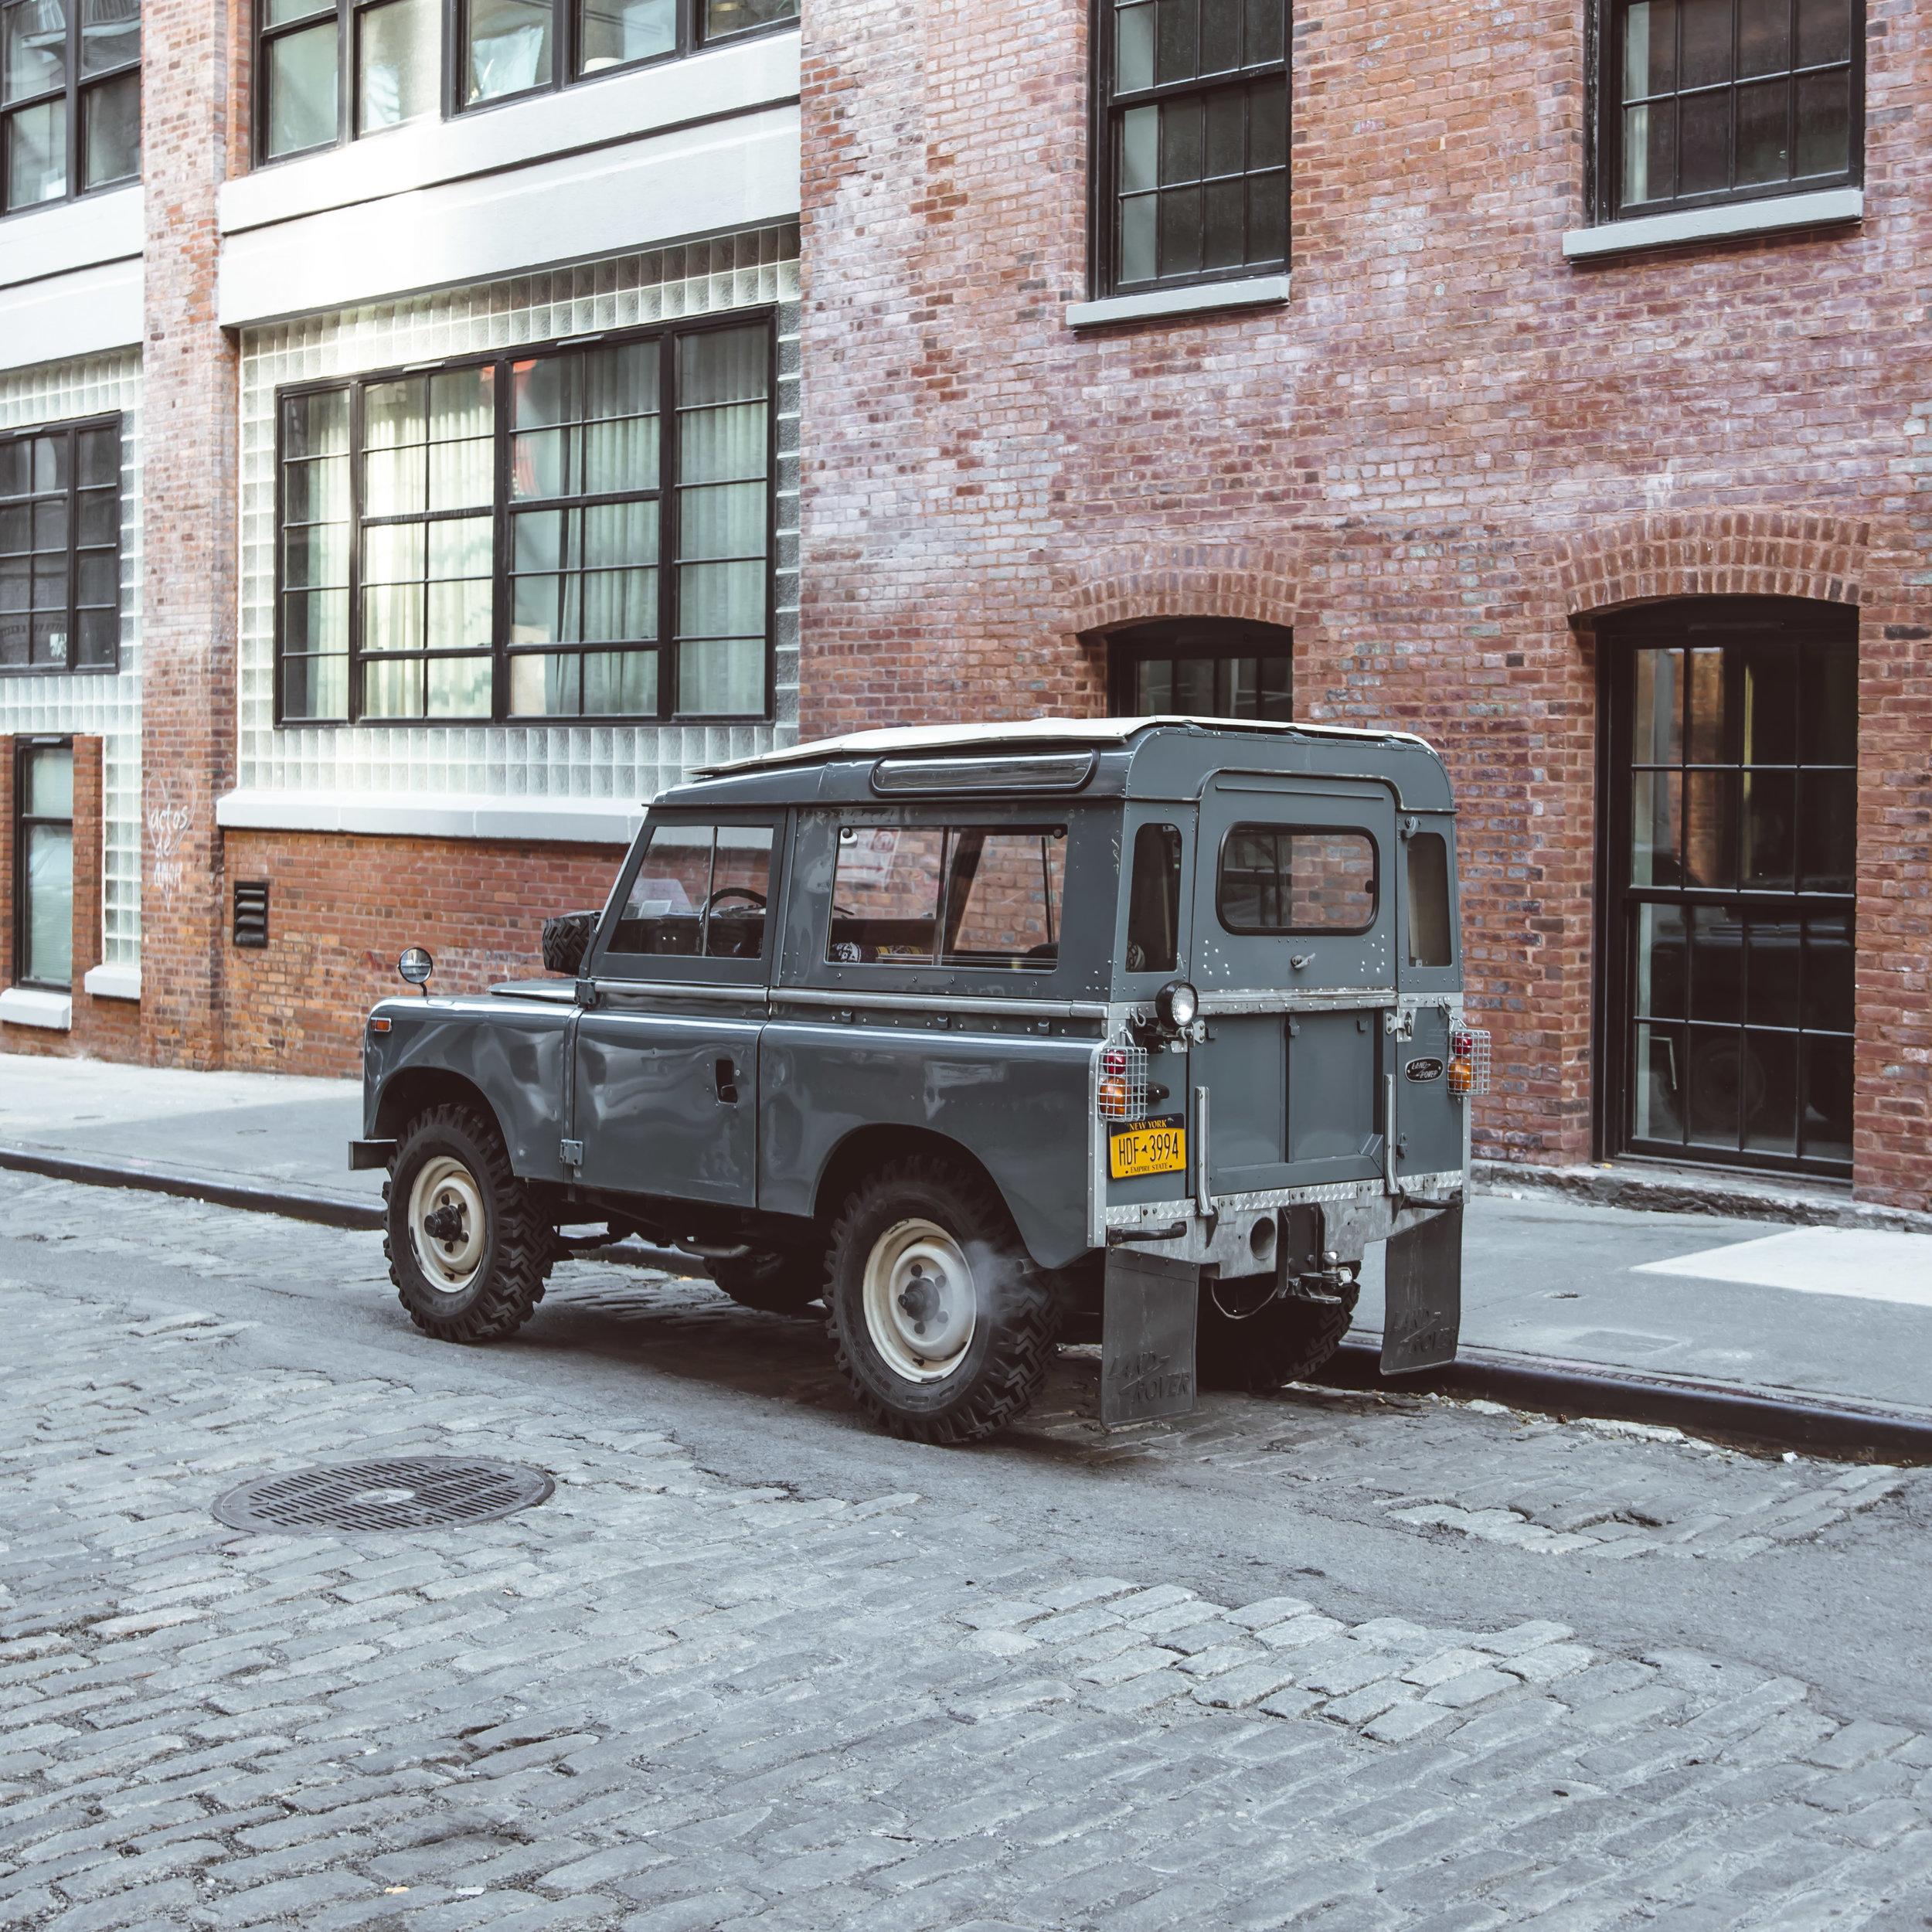 xlarge_1972_Land_Rover_Series_III_05.jpg